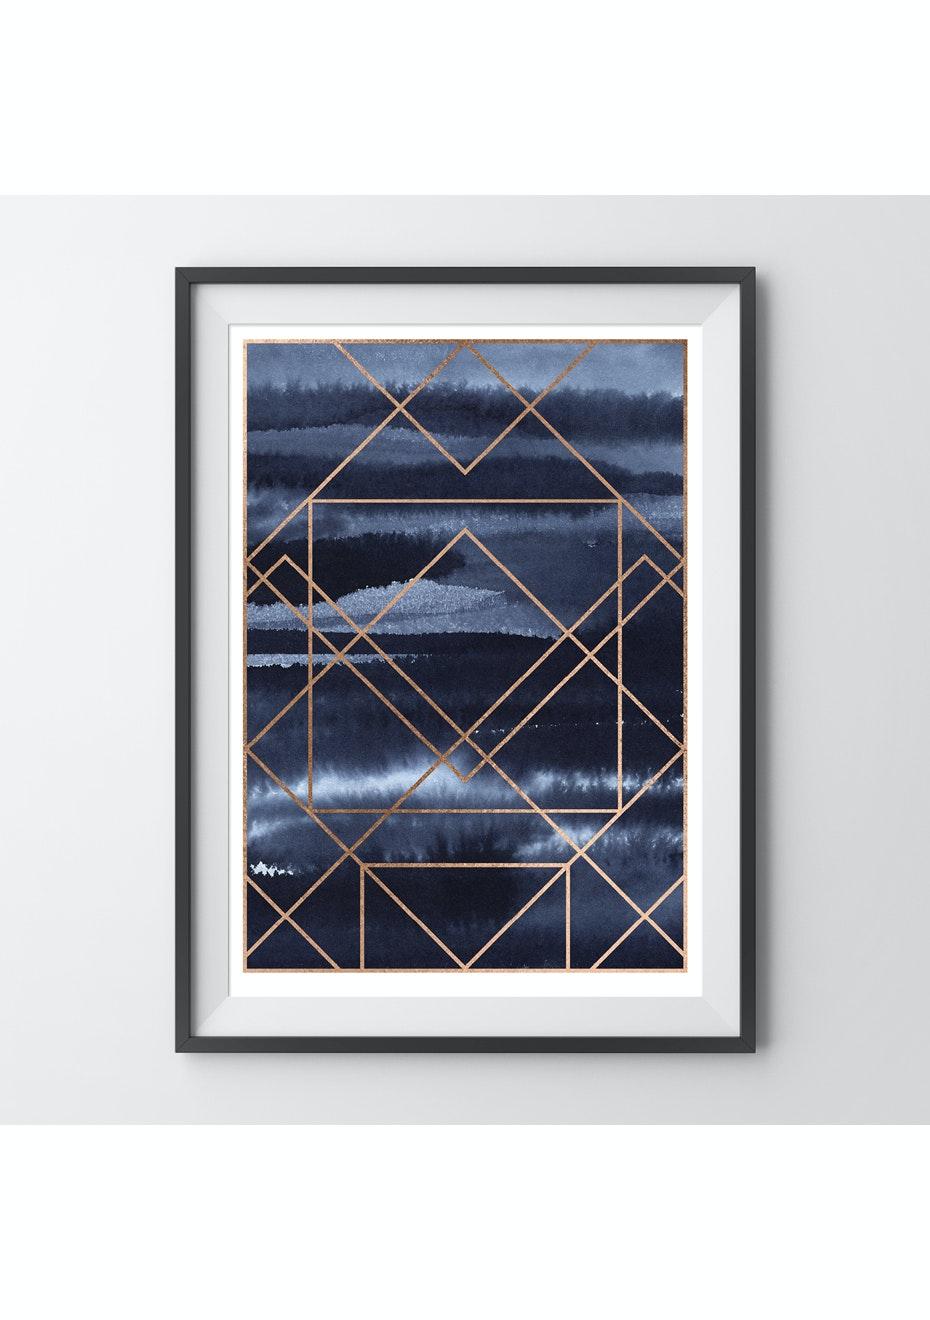 Simply Creative - Amethyst - A3 Copper Foil Print